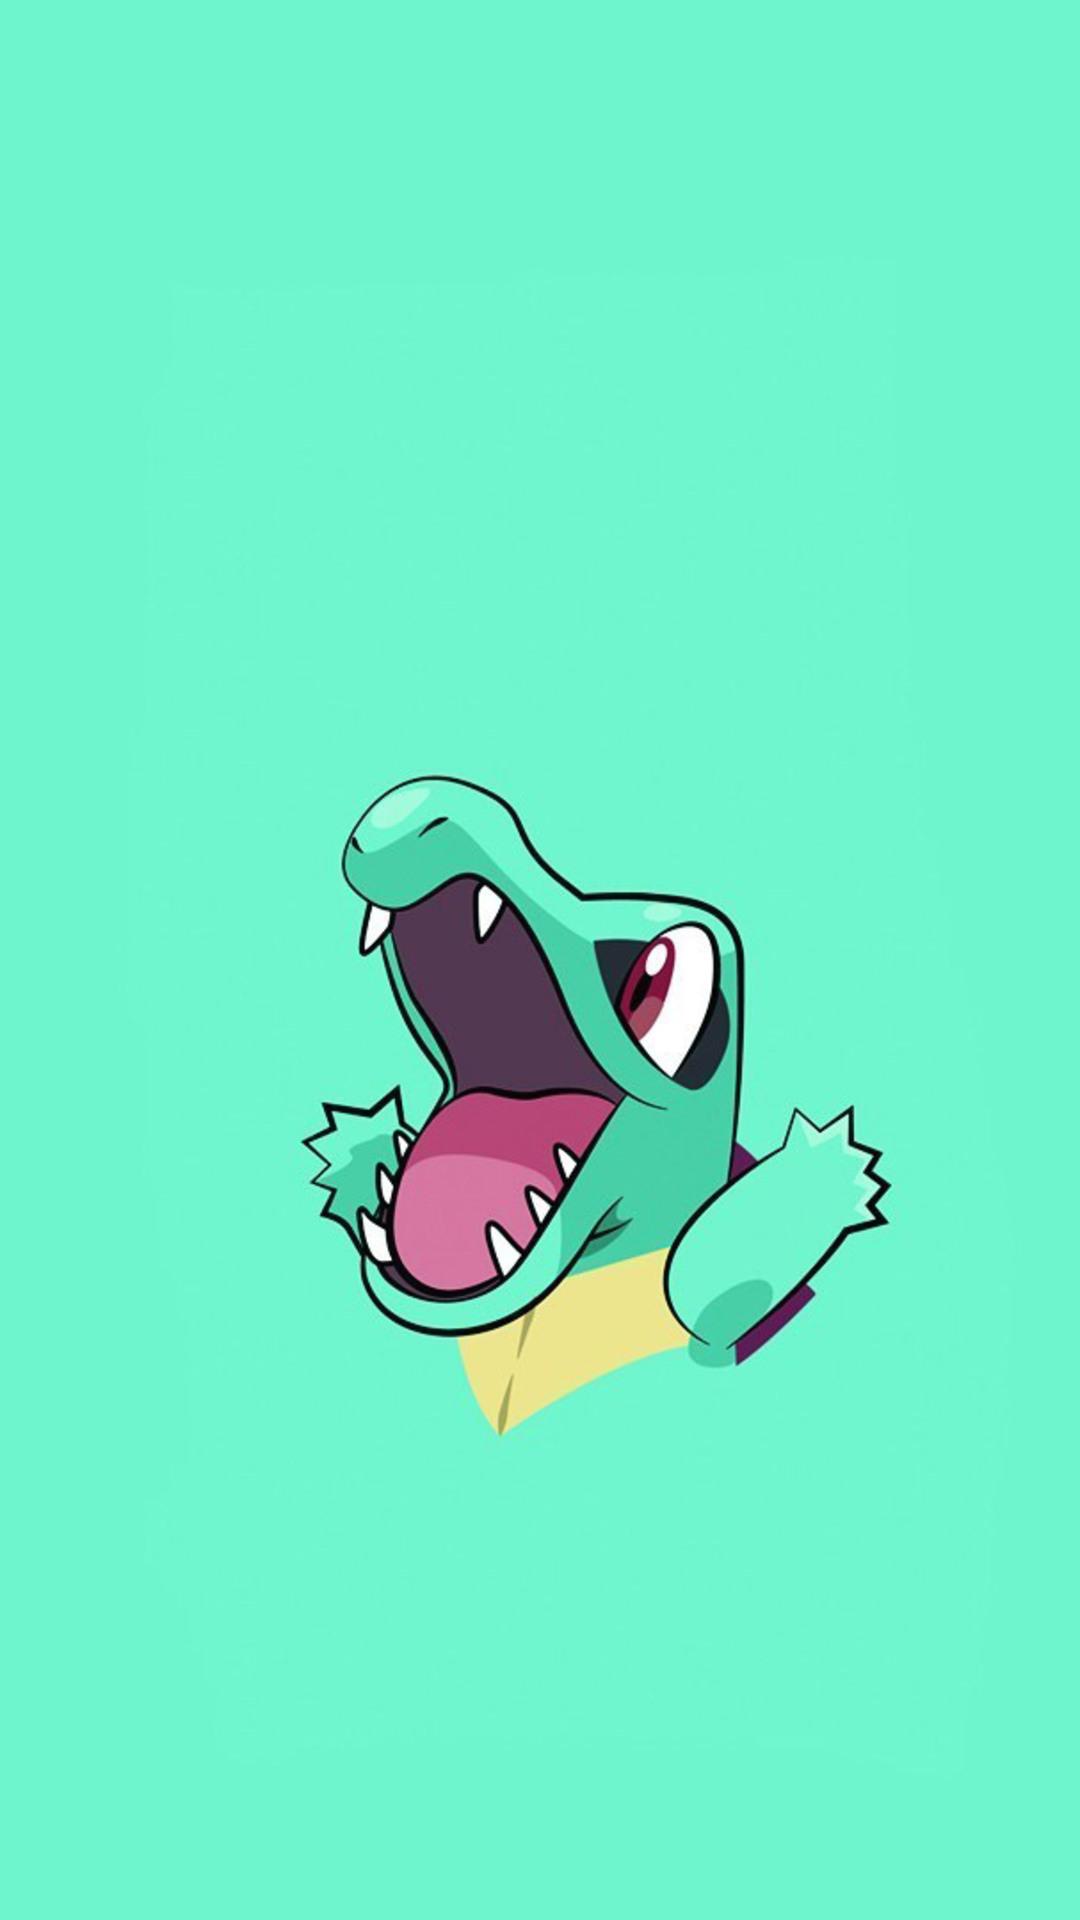 1080x1920 Pokemon Totodile Minimalism Iphone 7 6s 6 Plus Pixel Xl